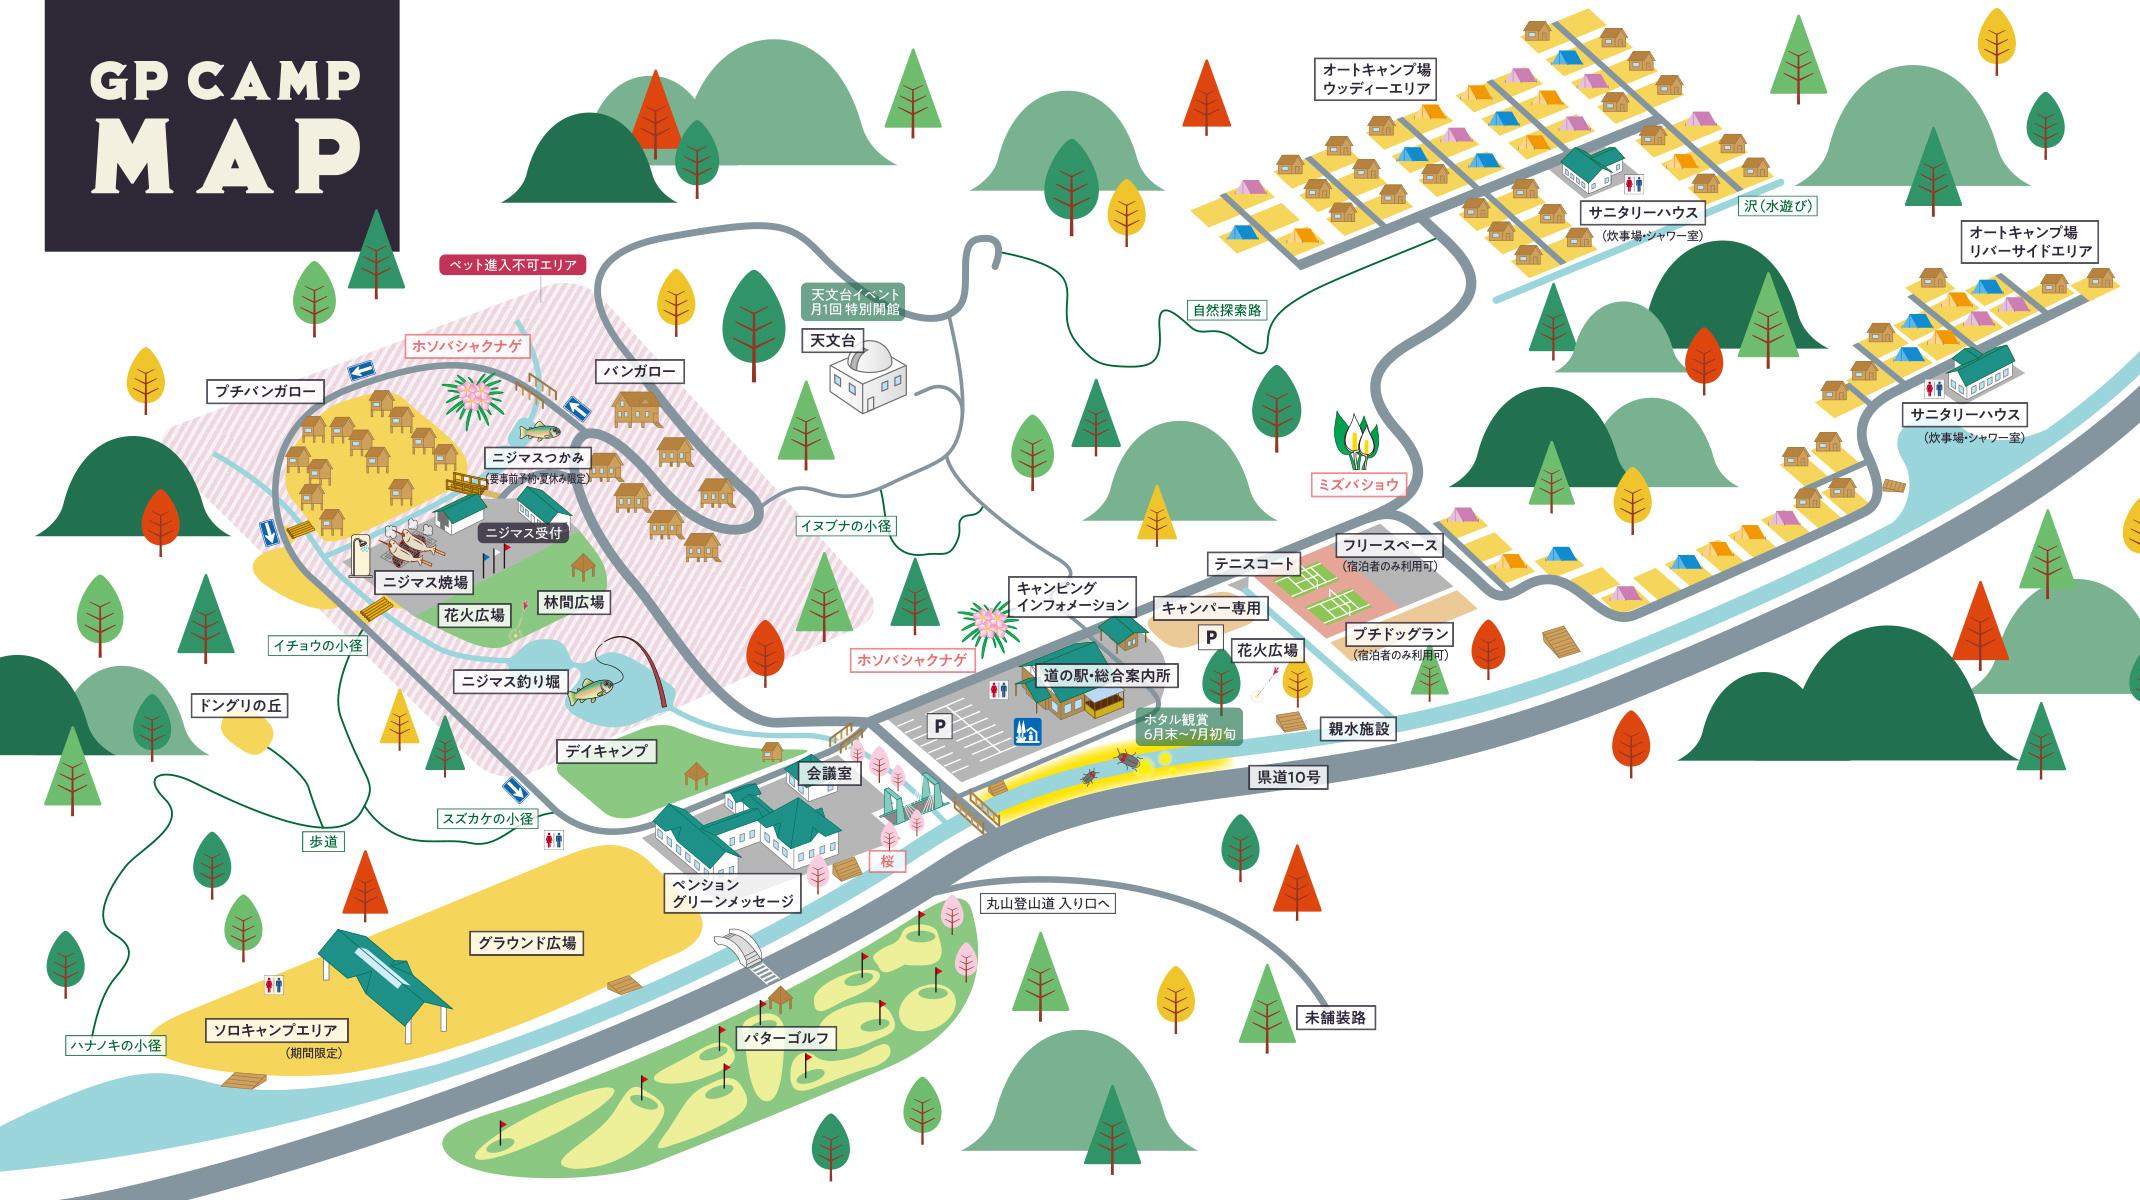 GP CAMP MAP